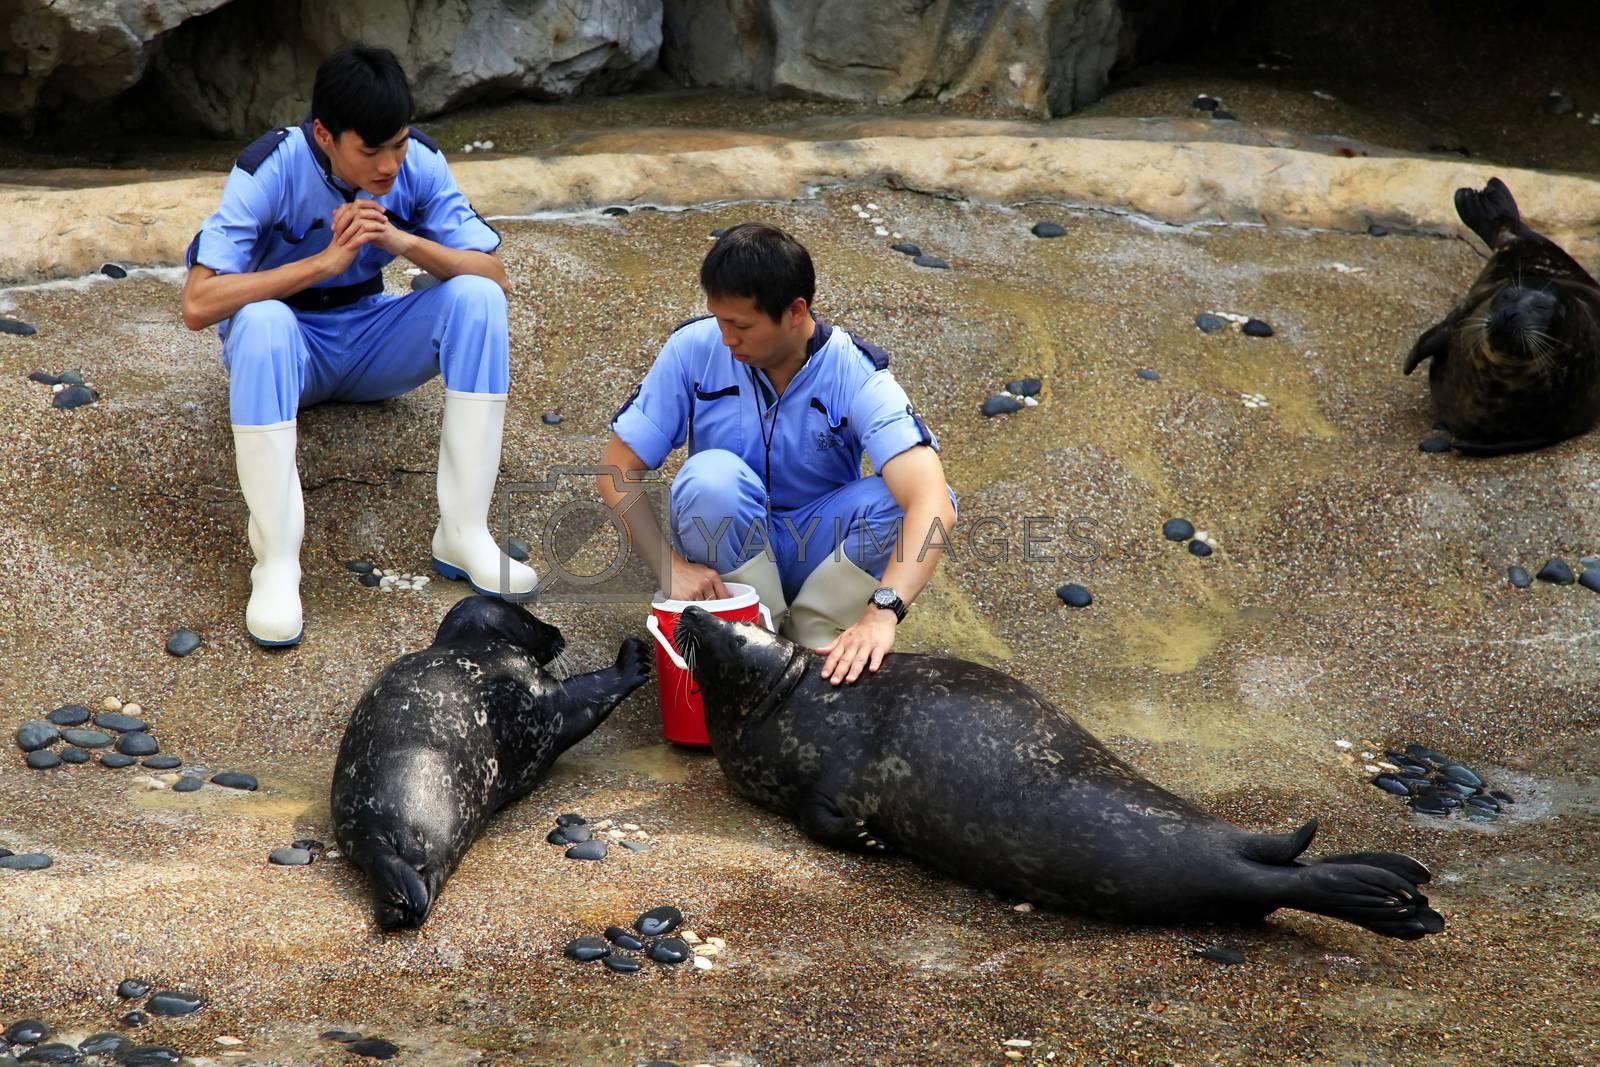 Hong Kong, Hong Kong - March 30, 2012:  veterinarians check the health status of sea lions in The grand aquarium, Ocean Park on March 30, 2012 in Hong Kong